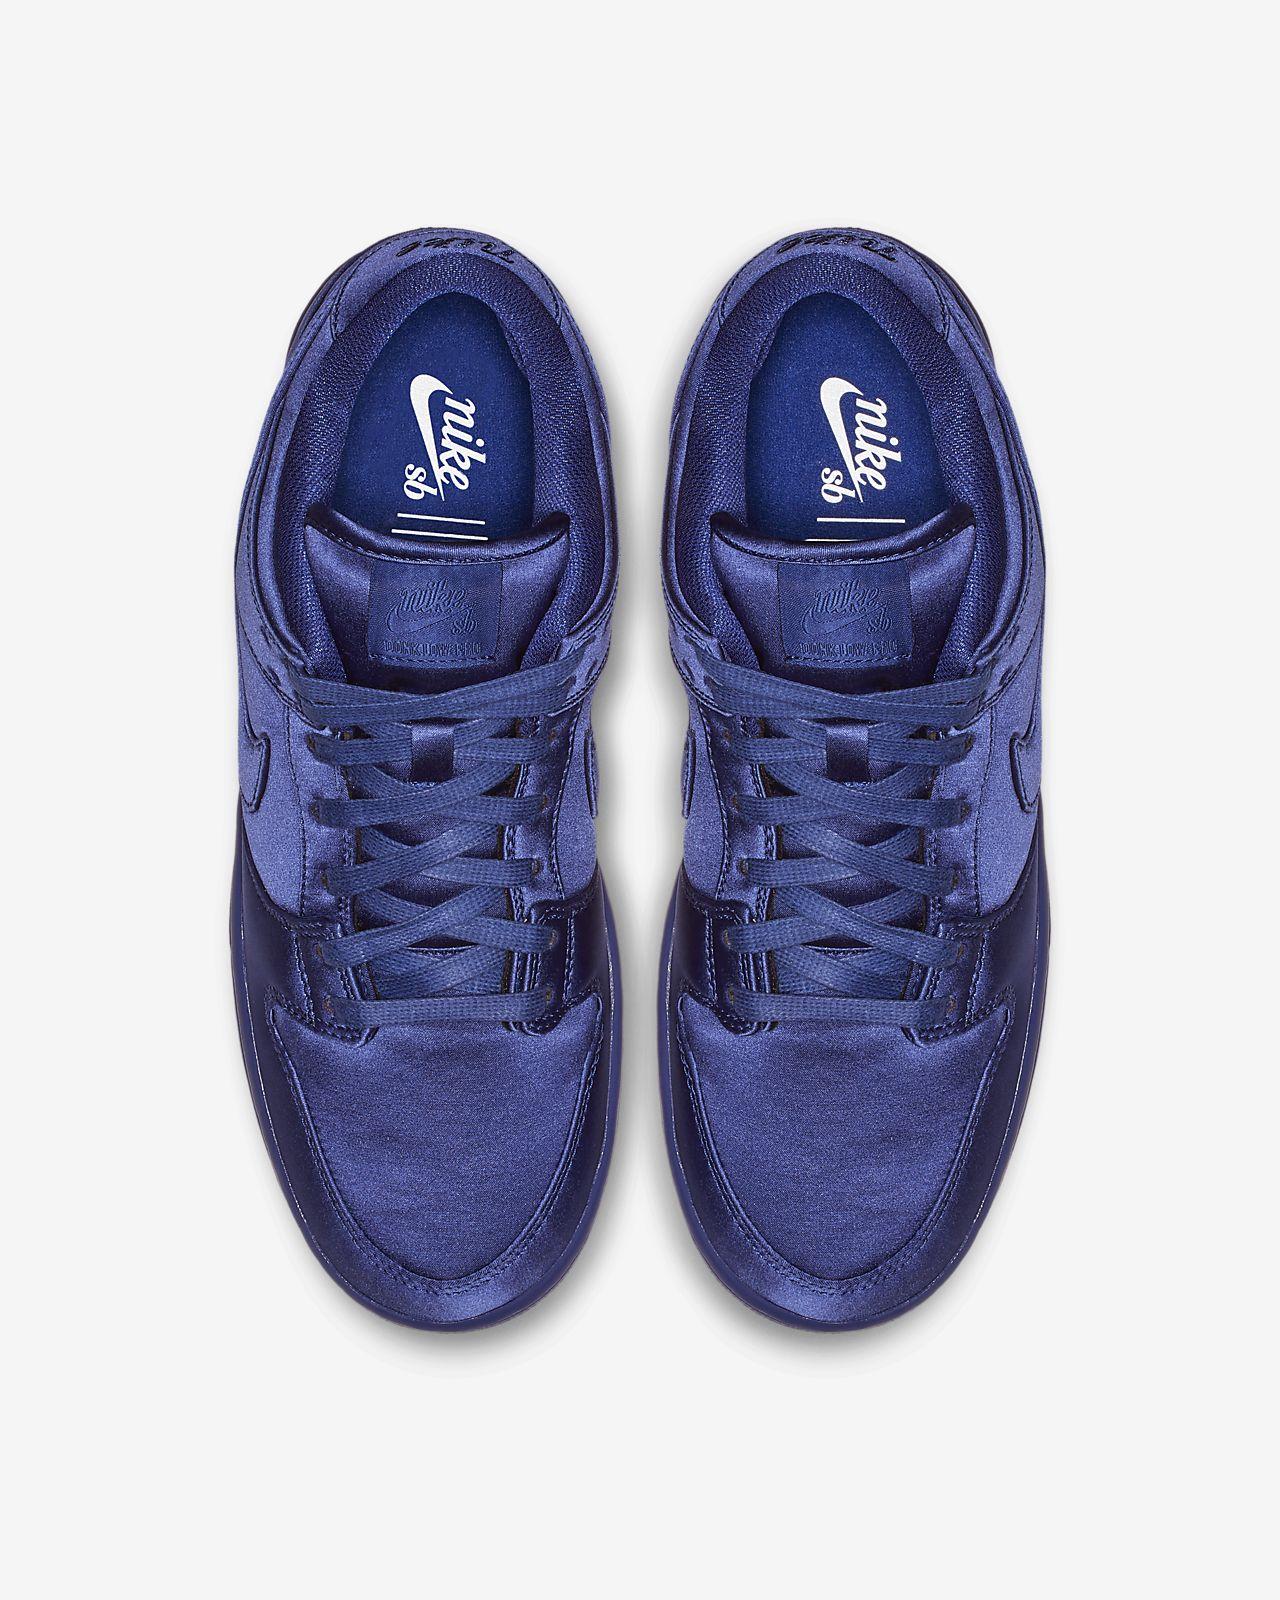 best loved 2df6a e24c7 Chaussure de skateboard Nike SB Dunk Low TRD NBA. Nike.com FR